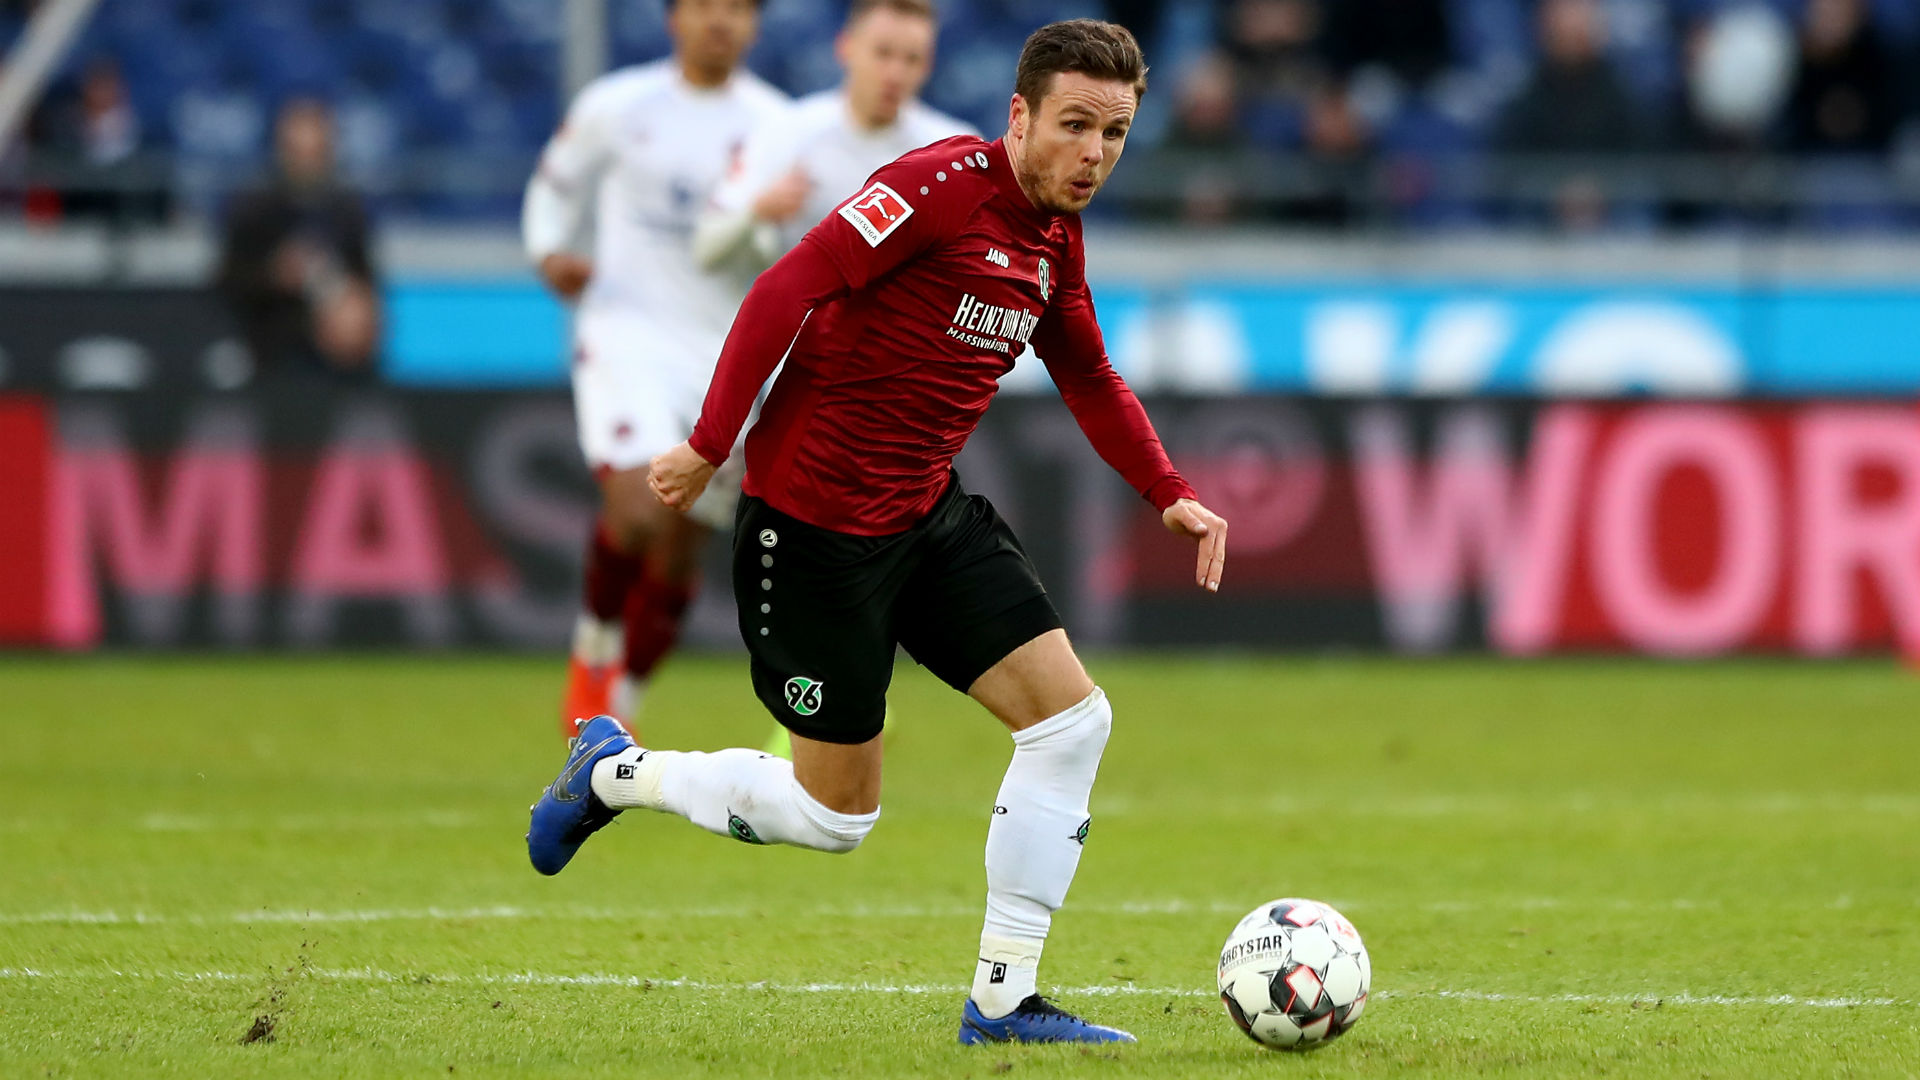 Wanderers sign Muller from Eintracht Frankfurt